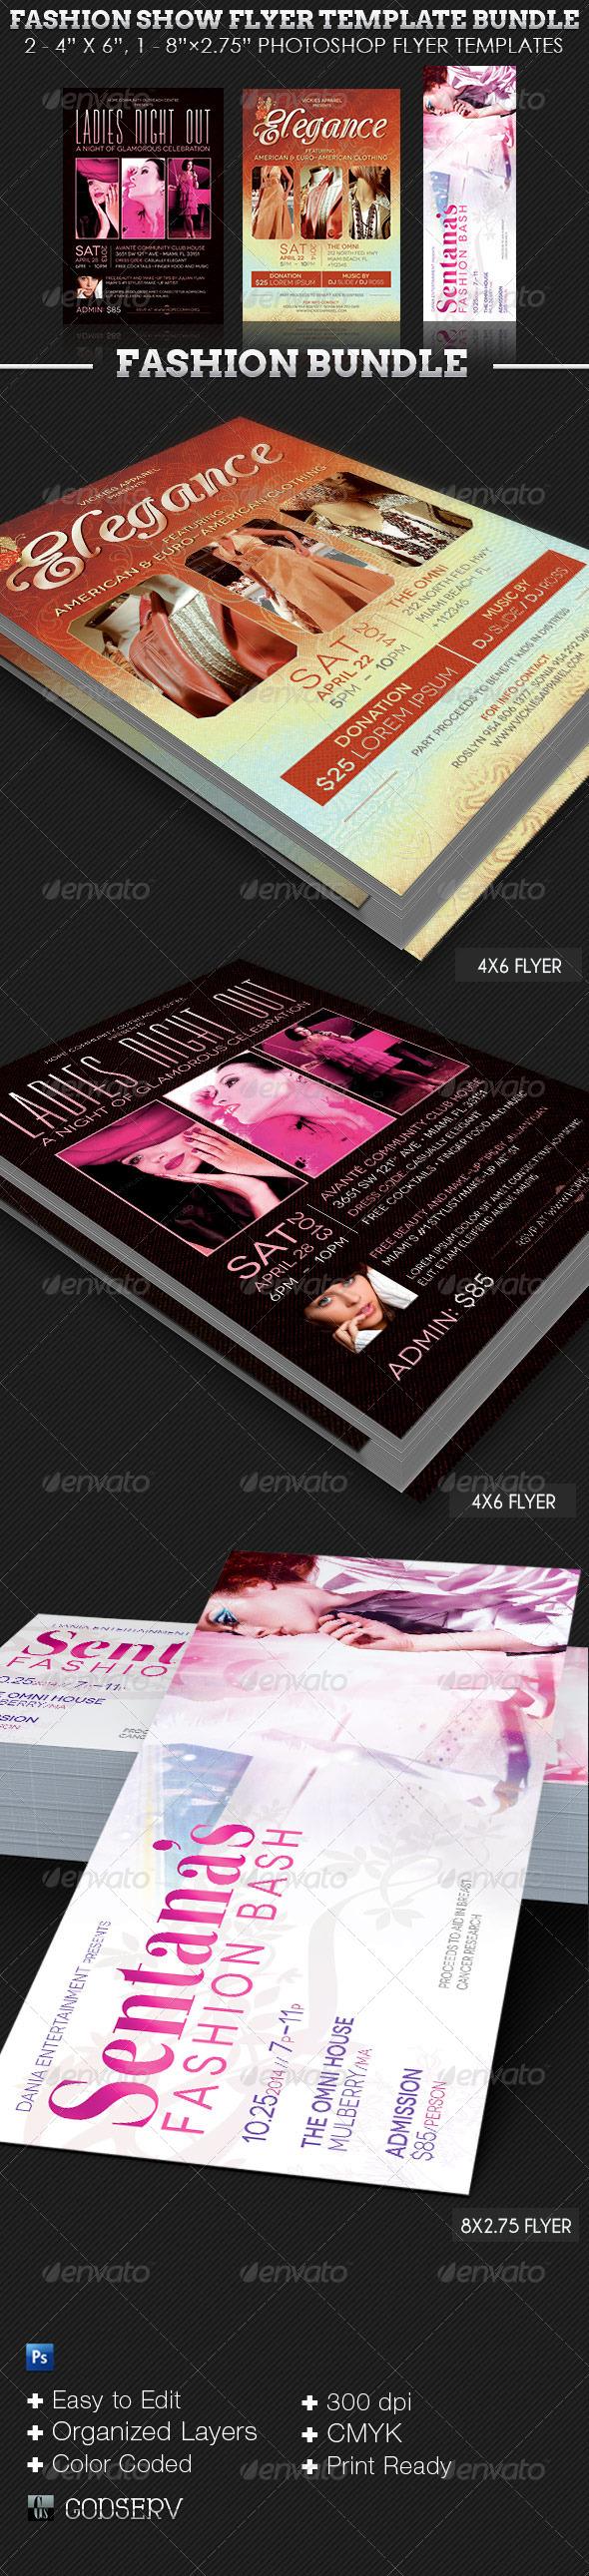 Fashion Show Flyer Template Bundle - Events Flyers